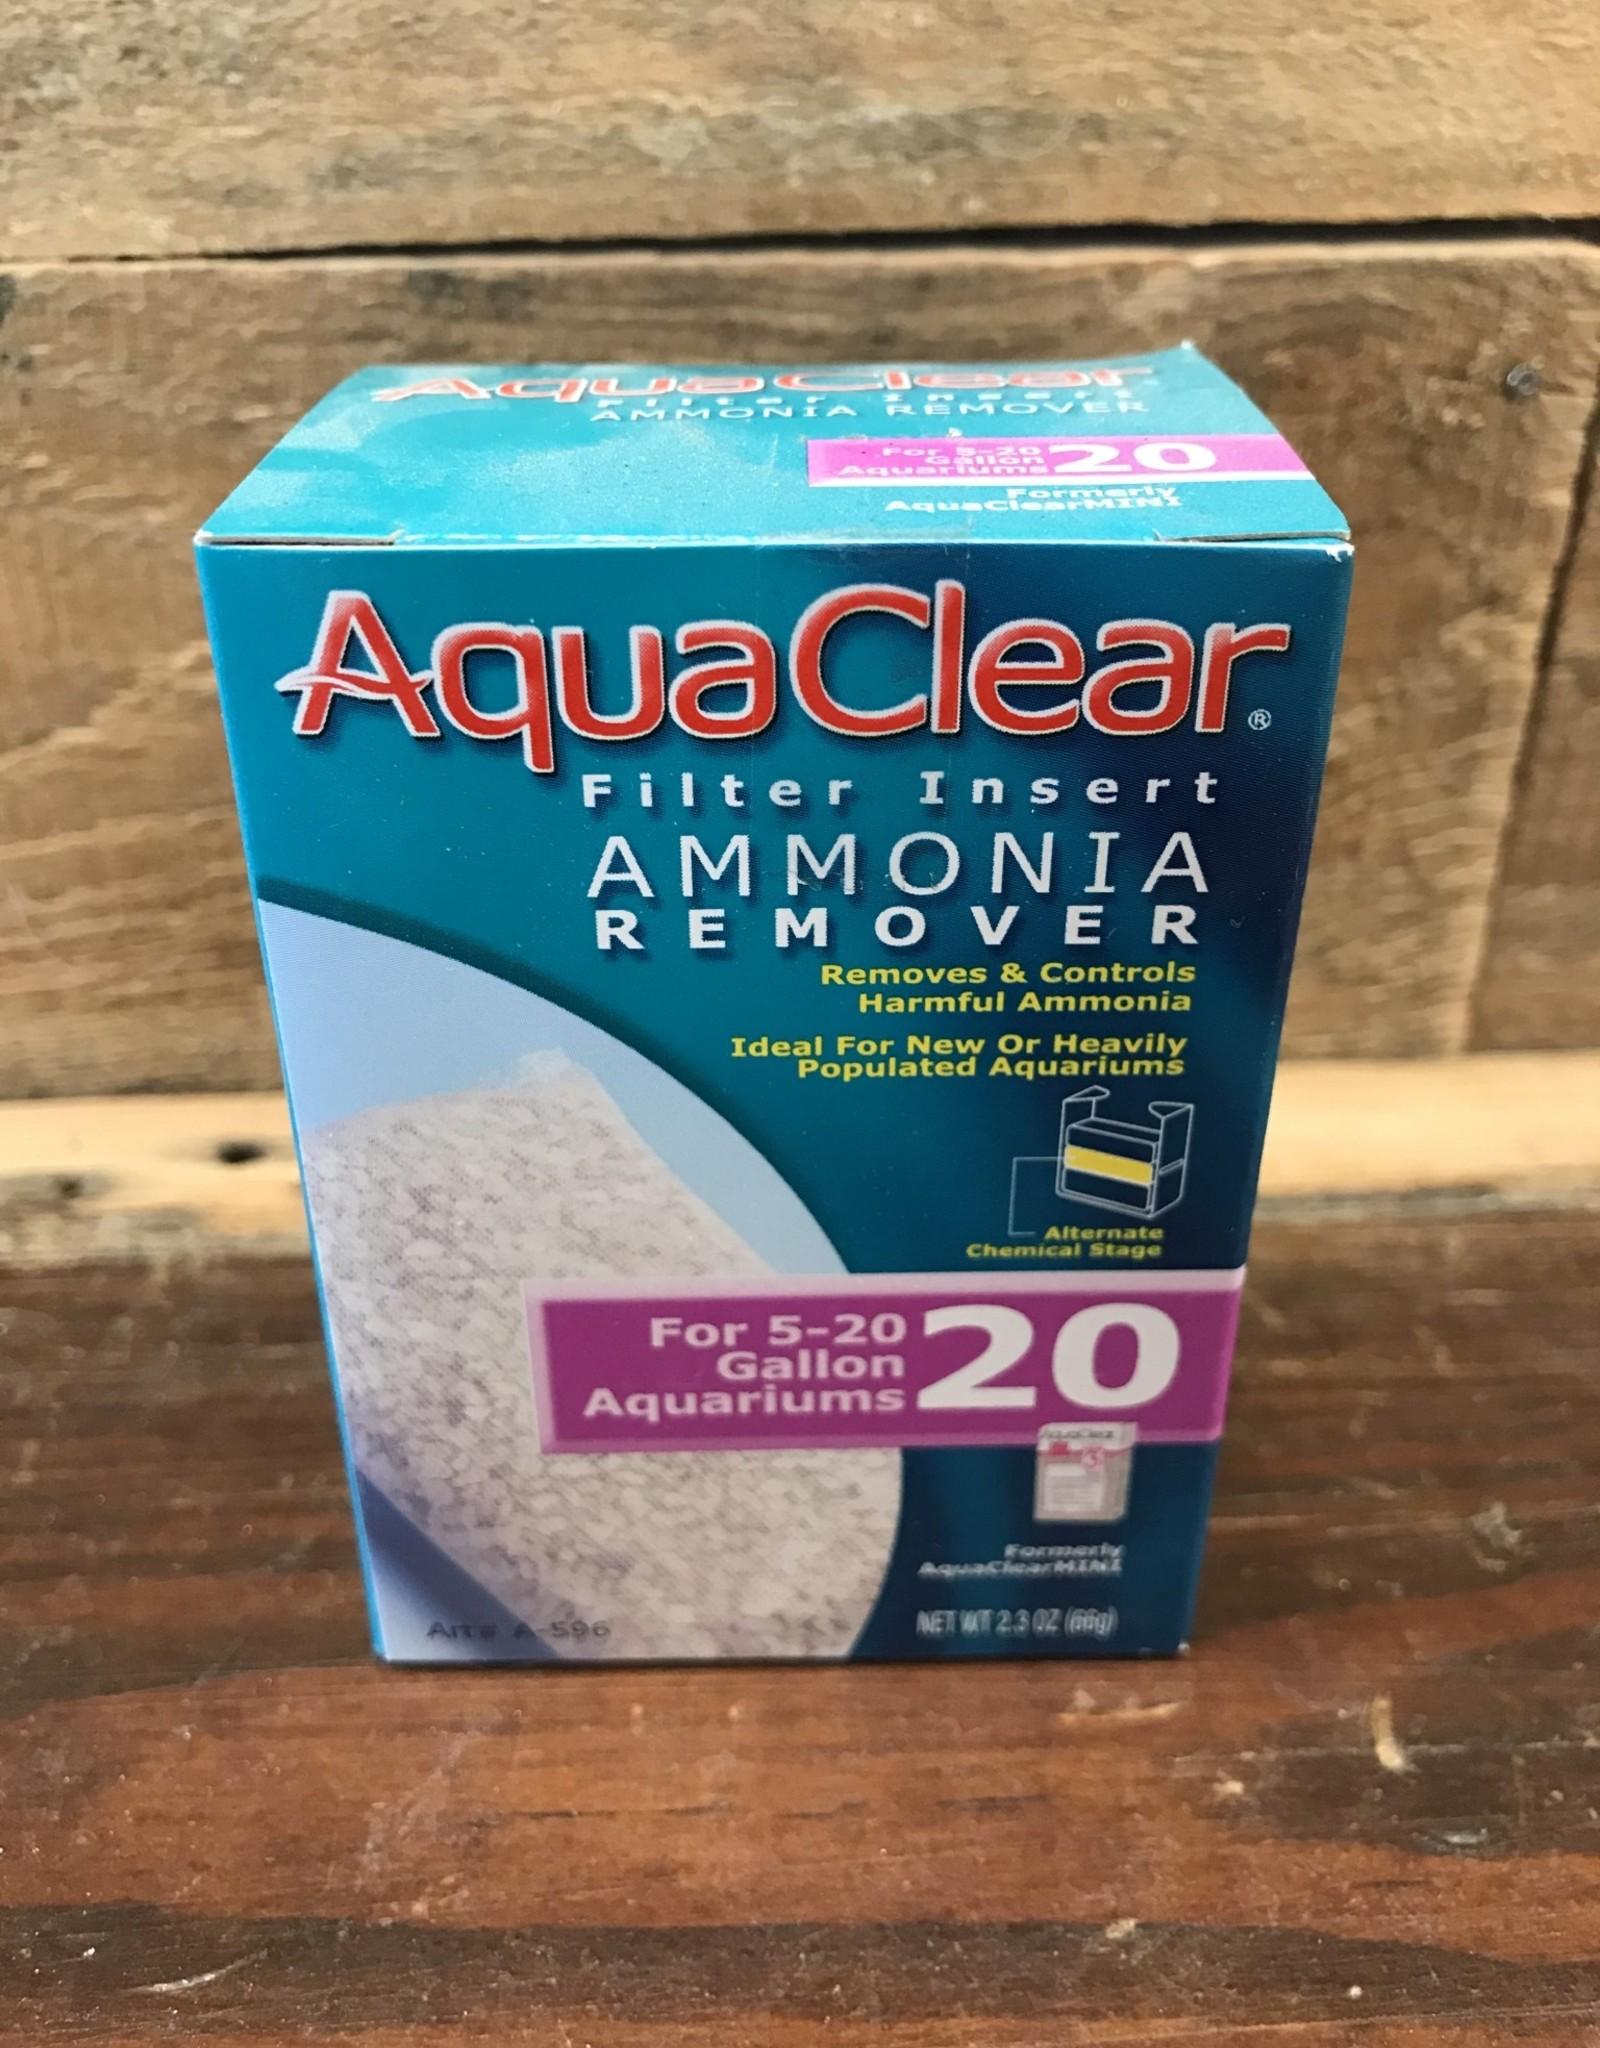 Hagen AquaClear 20 Ammonia Remover, 2.1 oz